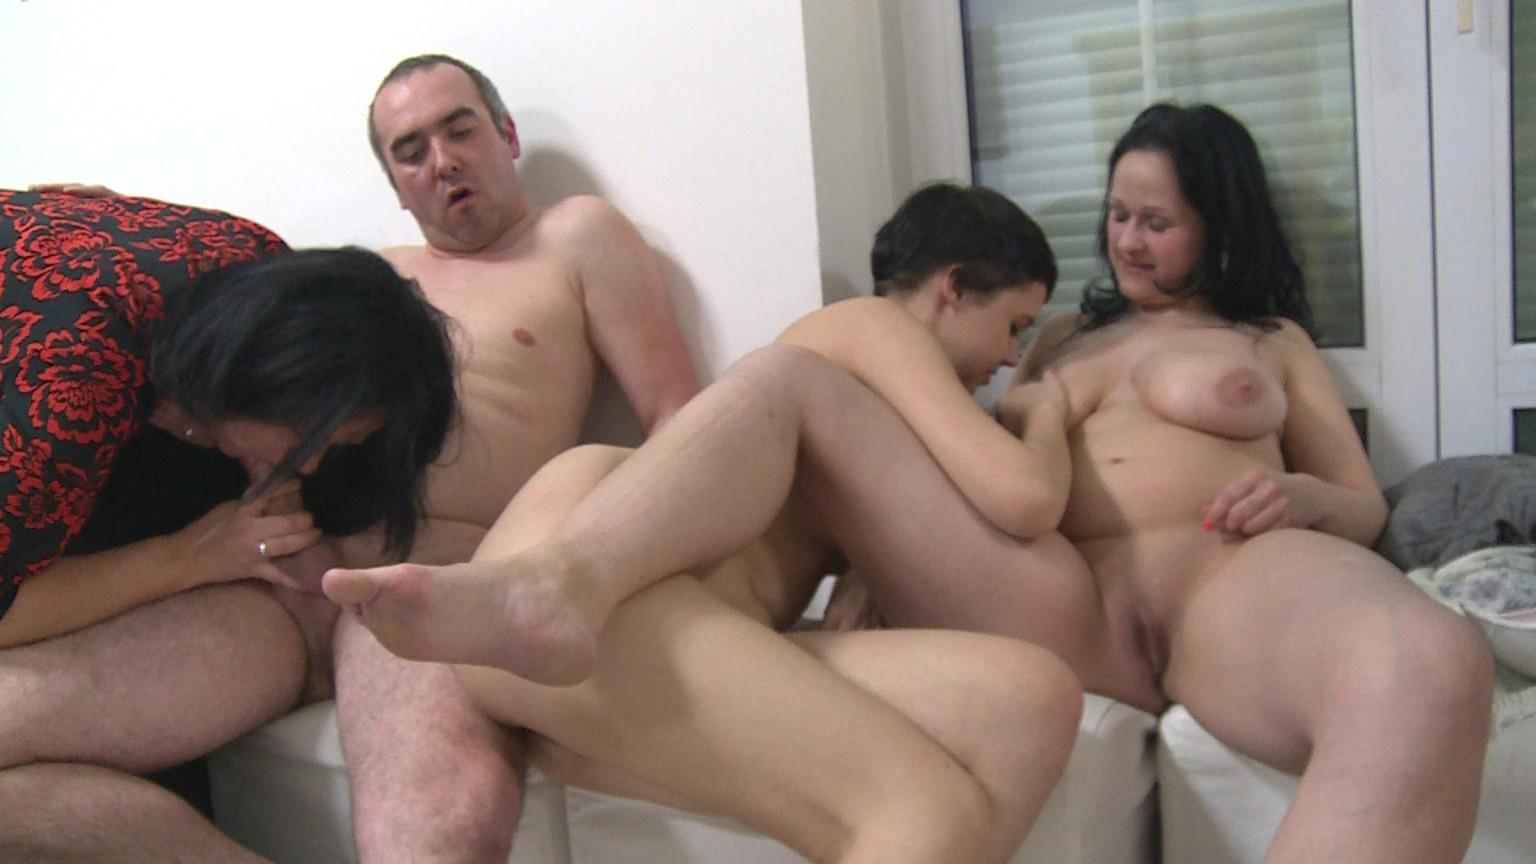 Hot Nude 18+ Jill kelly upskirt